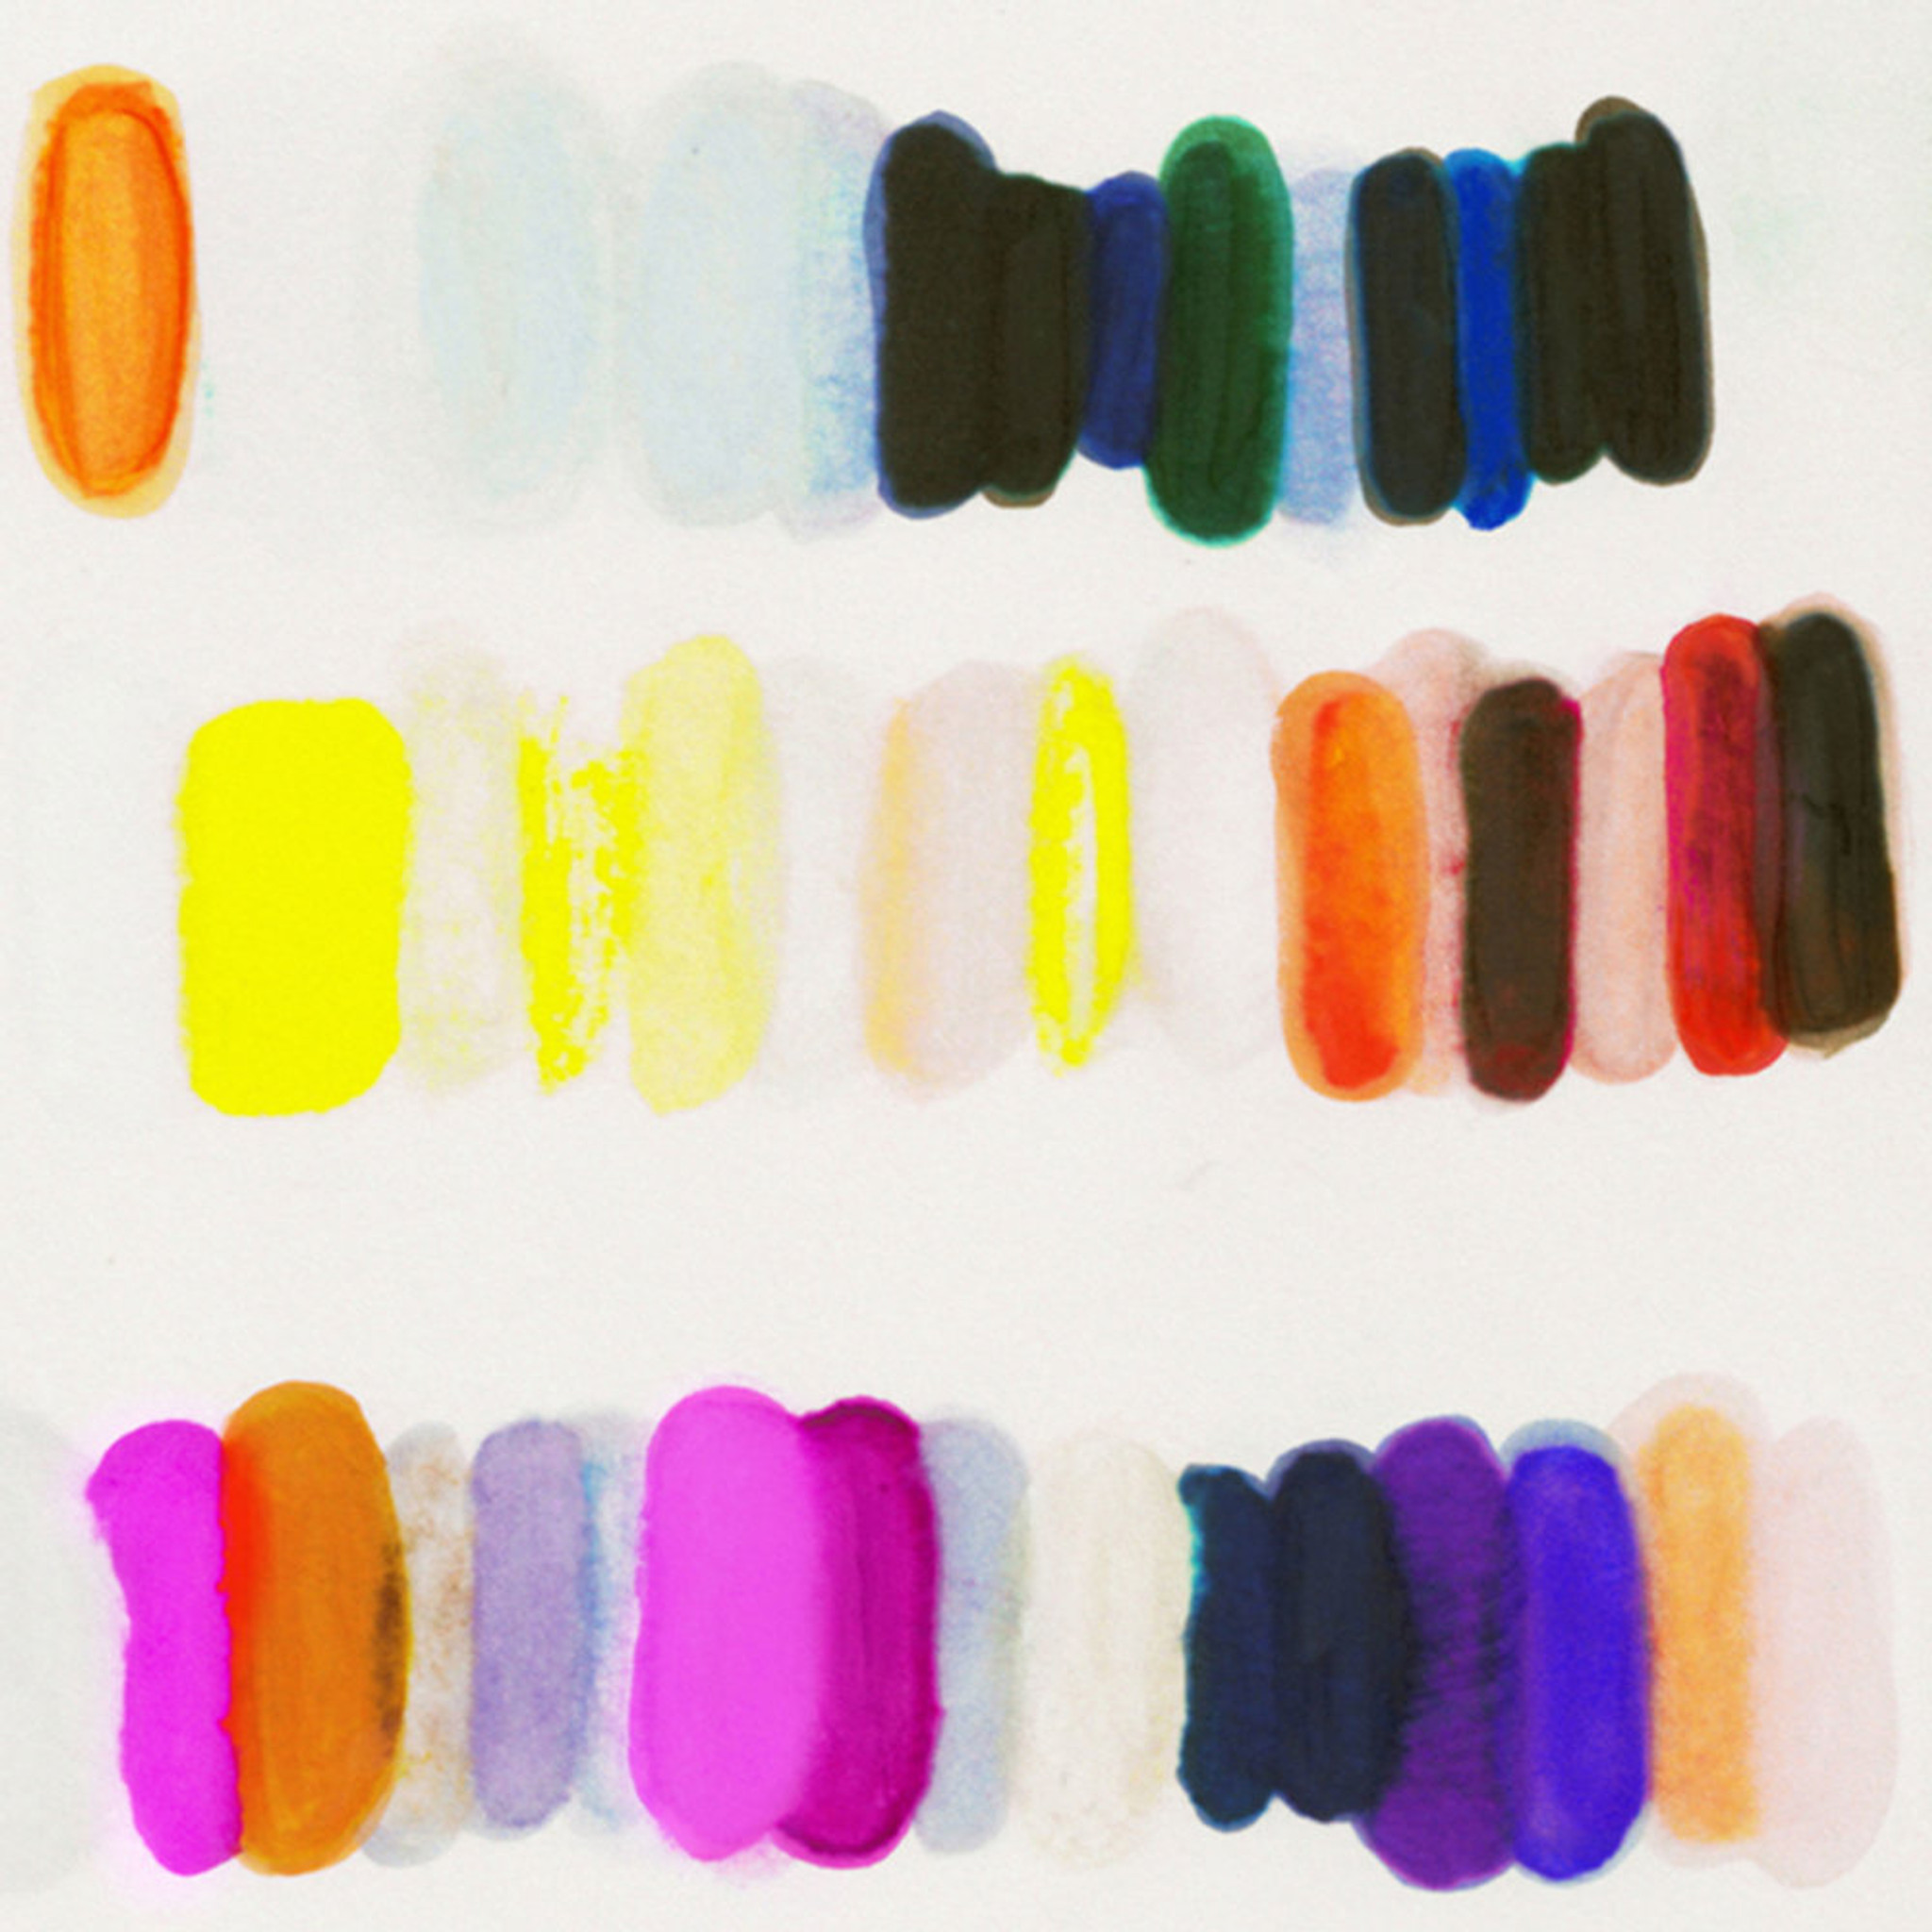 kristi kohut heavenly palette colorful modern abstract fine art print lucite shadow box frame